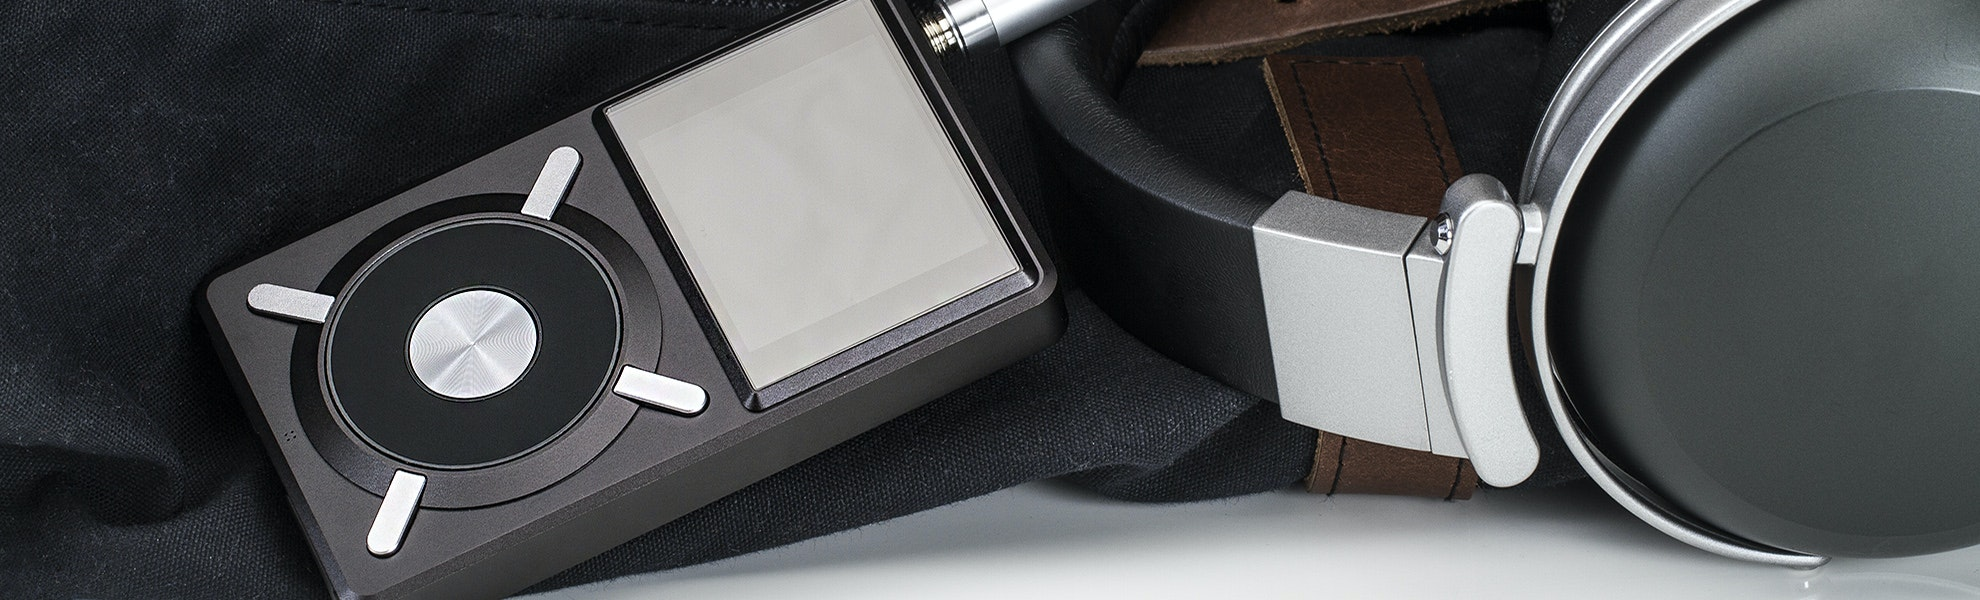 FiiO X5 Audiophile Music Player